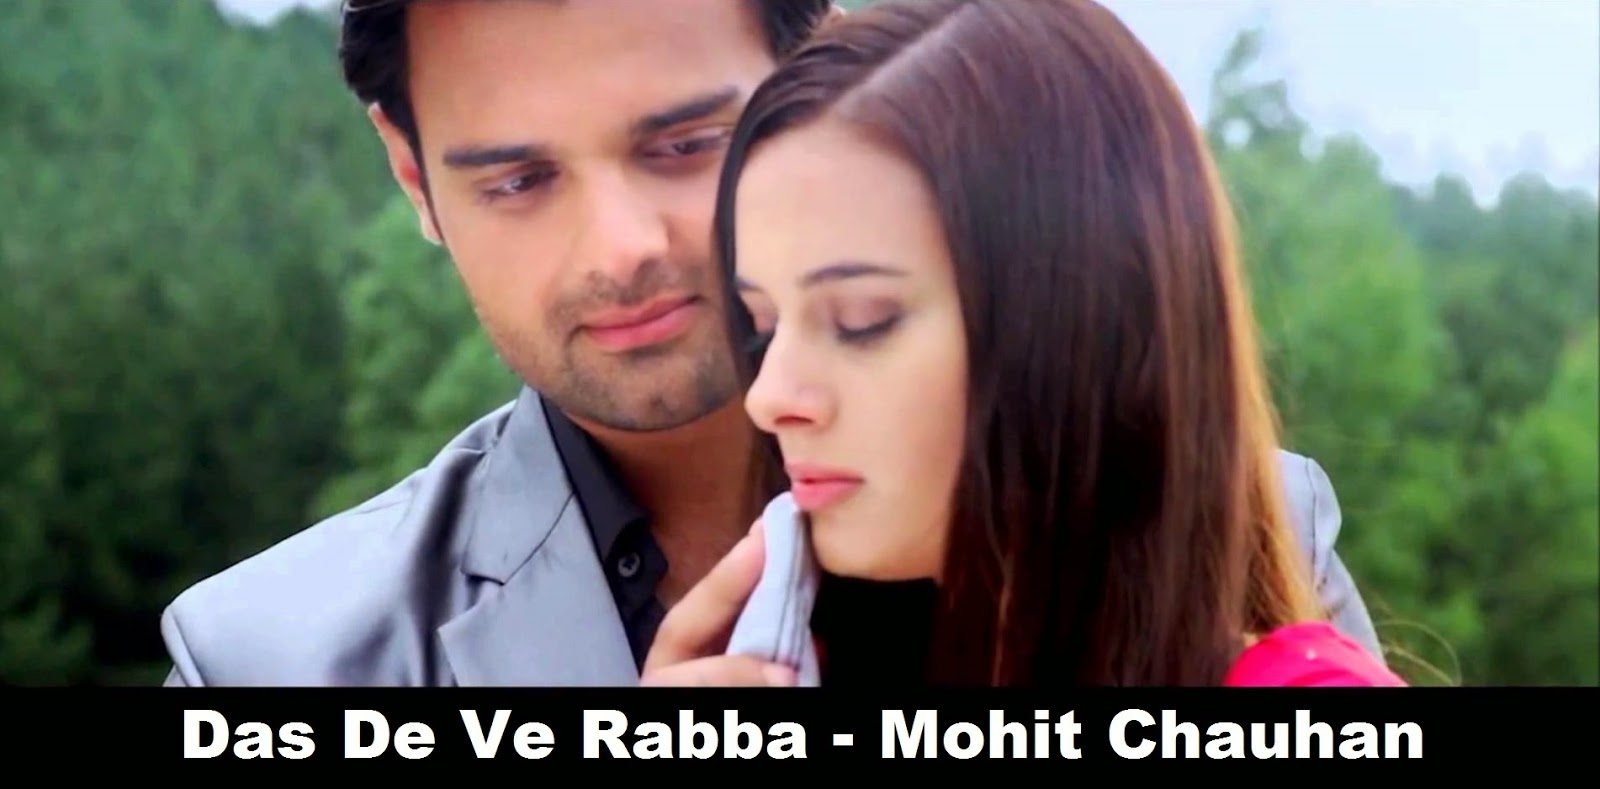 Das De Ve Rabba Mohit Chauhan - ISHQEDARRIYAAN